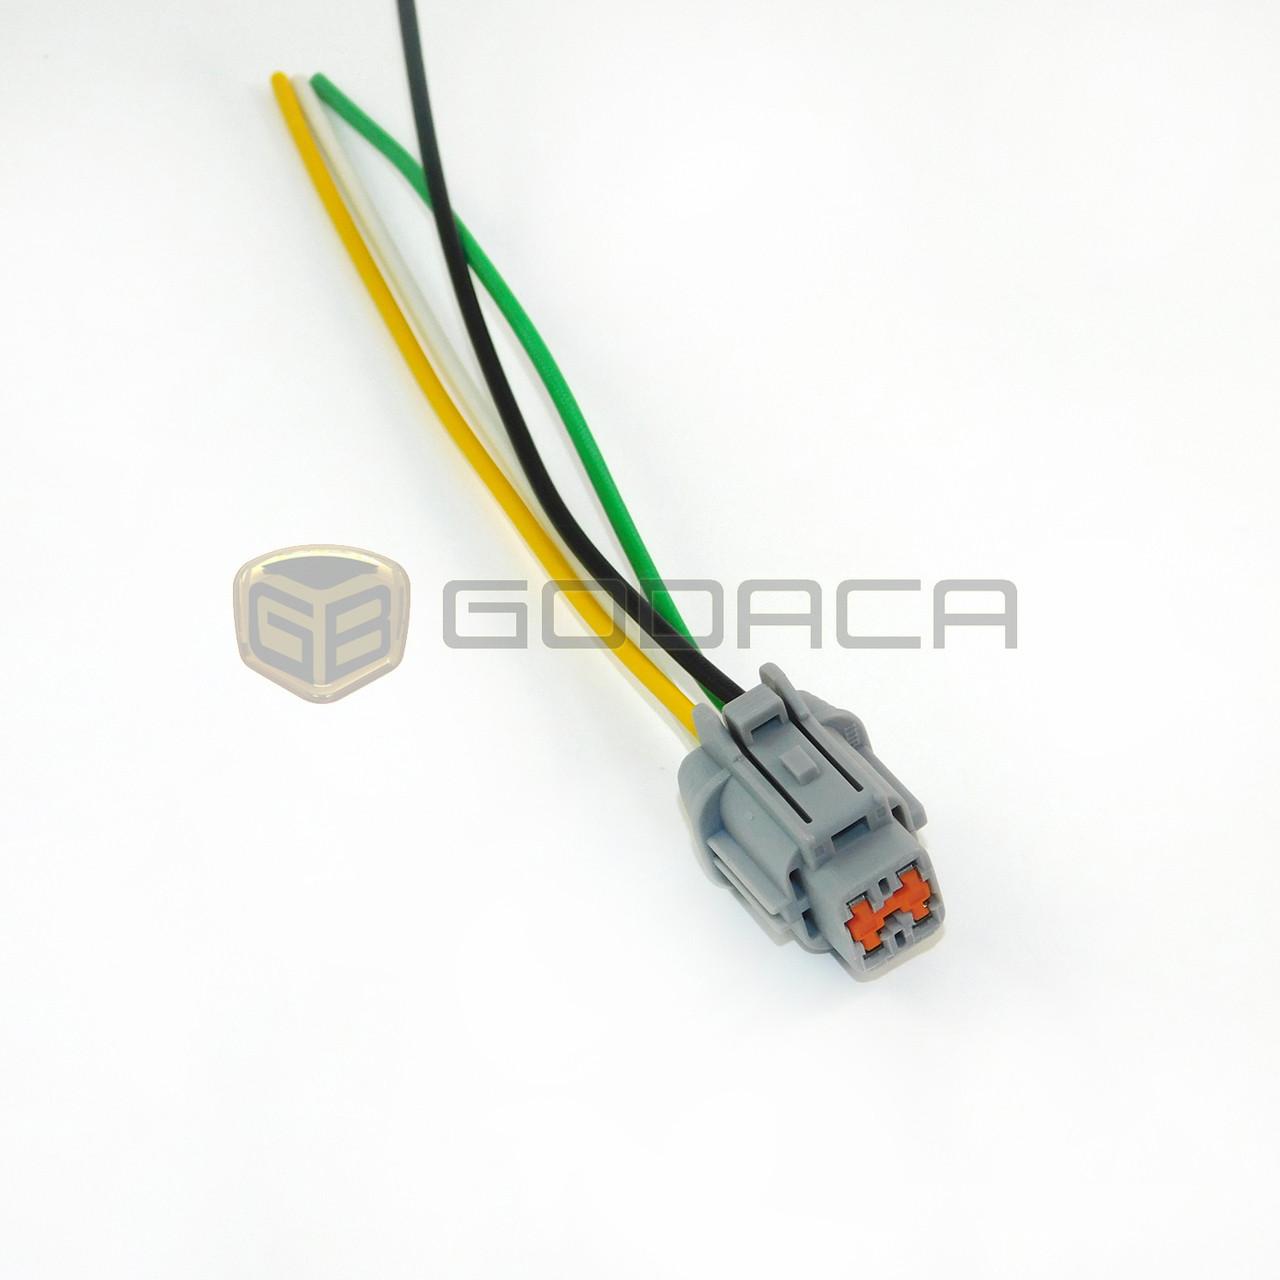 medium resolution of 1 x connector 4 way sensor repair connector wiring harness plug for nissan godaca llc